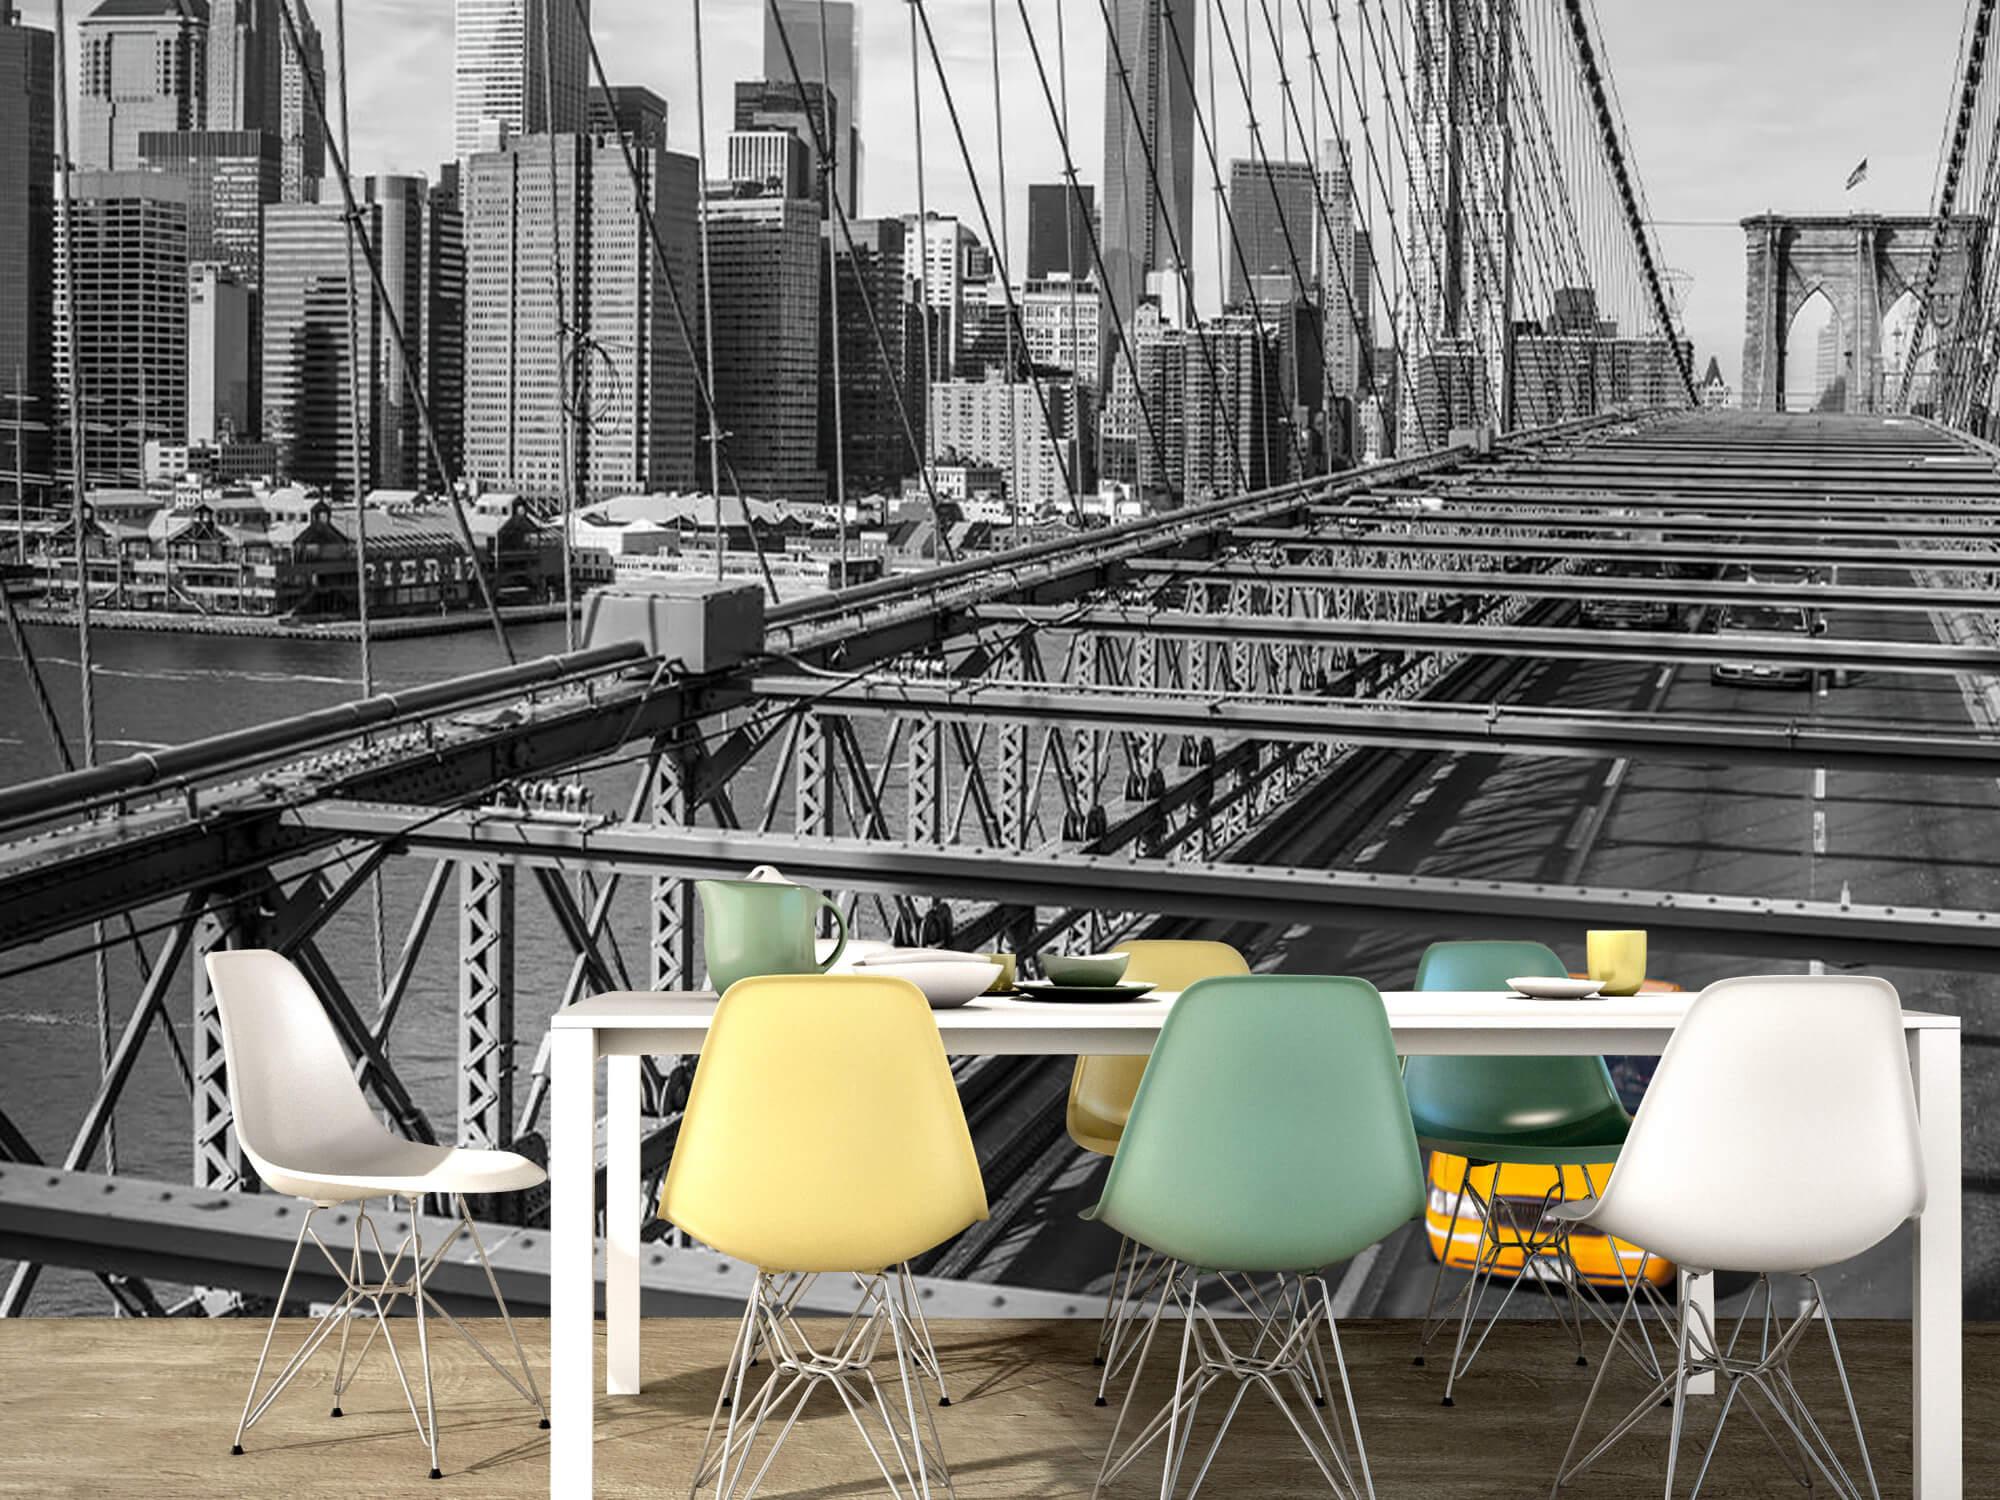 Un taxi sur le pont de Brooklyn 14